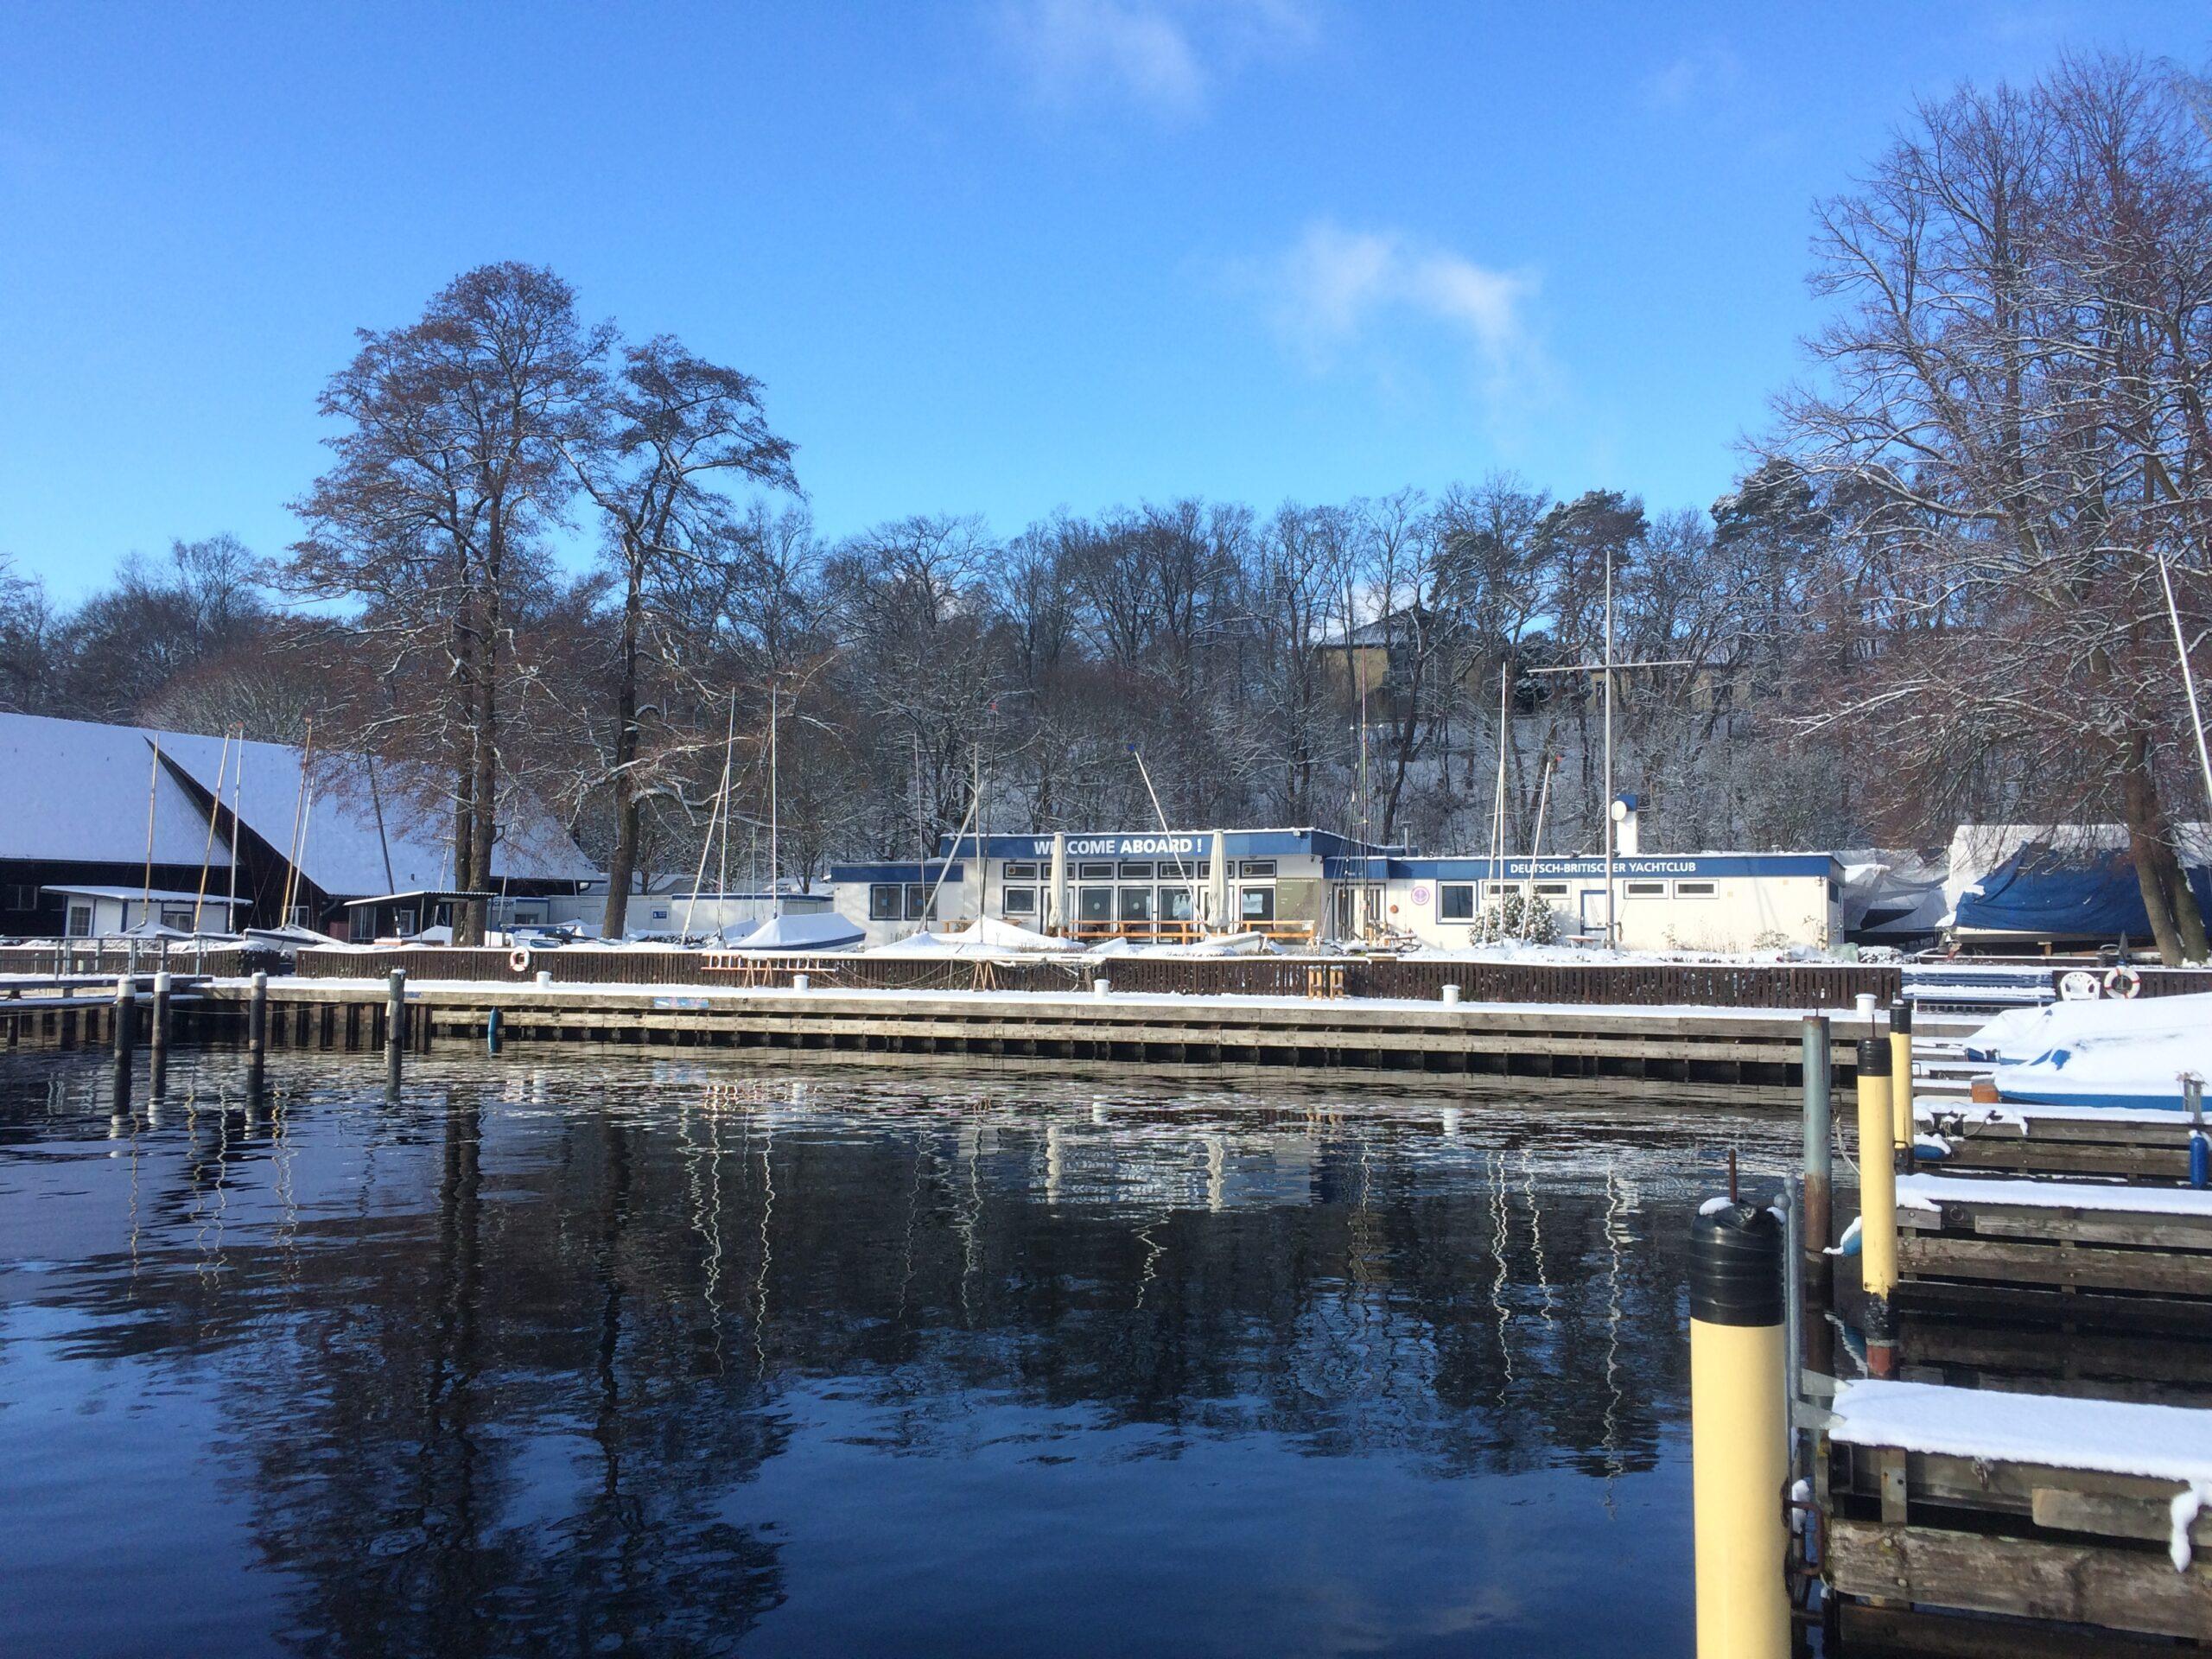 DBYC Clubhaus Impression Winter - 01/2021